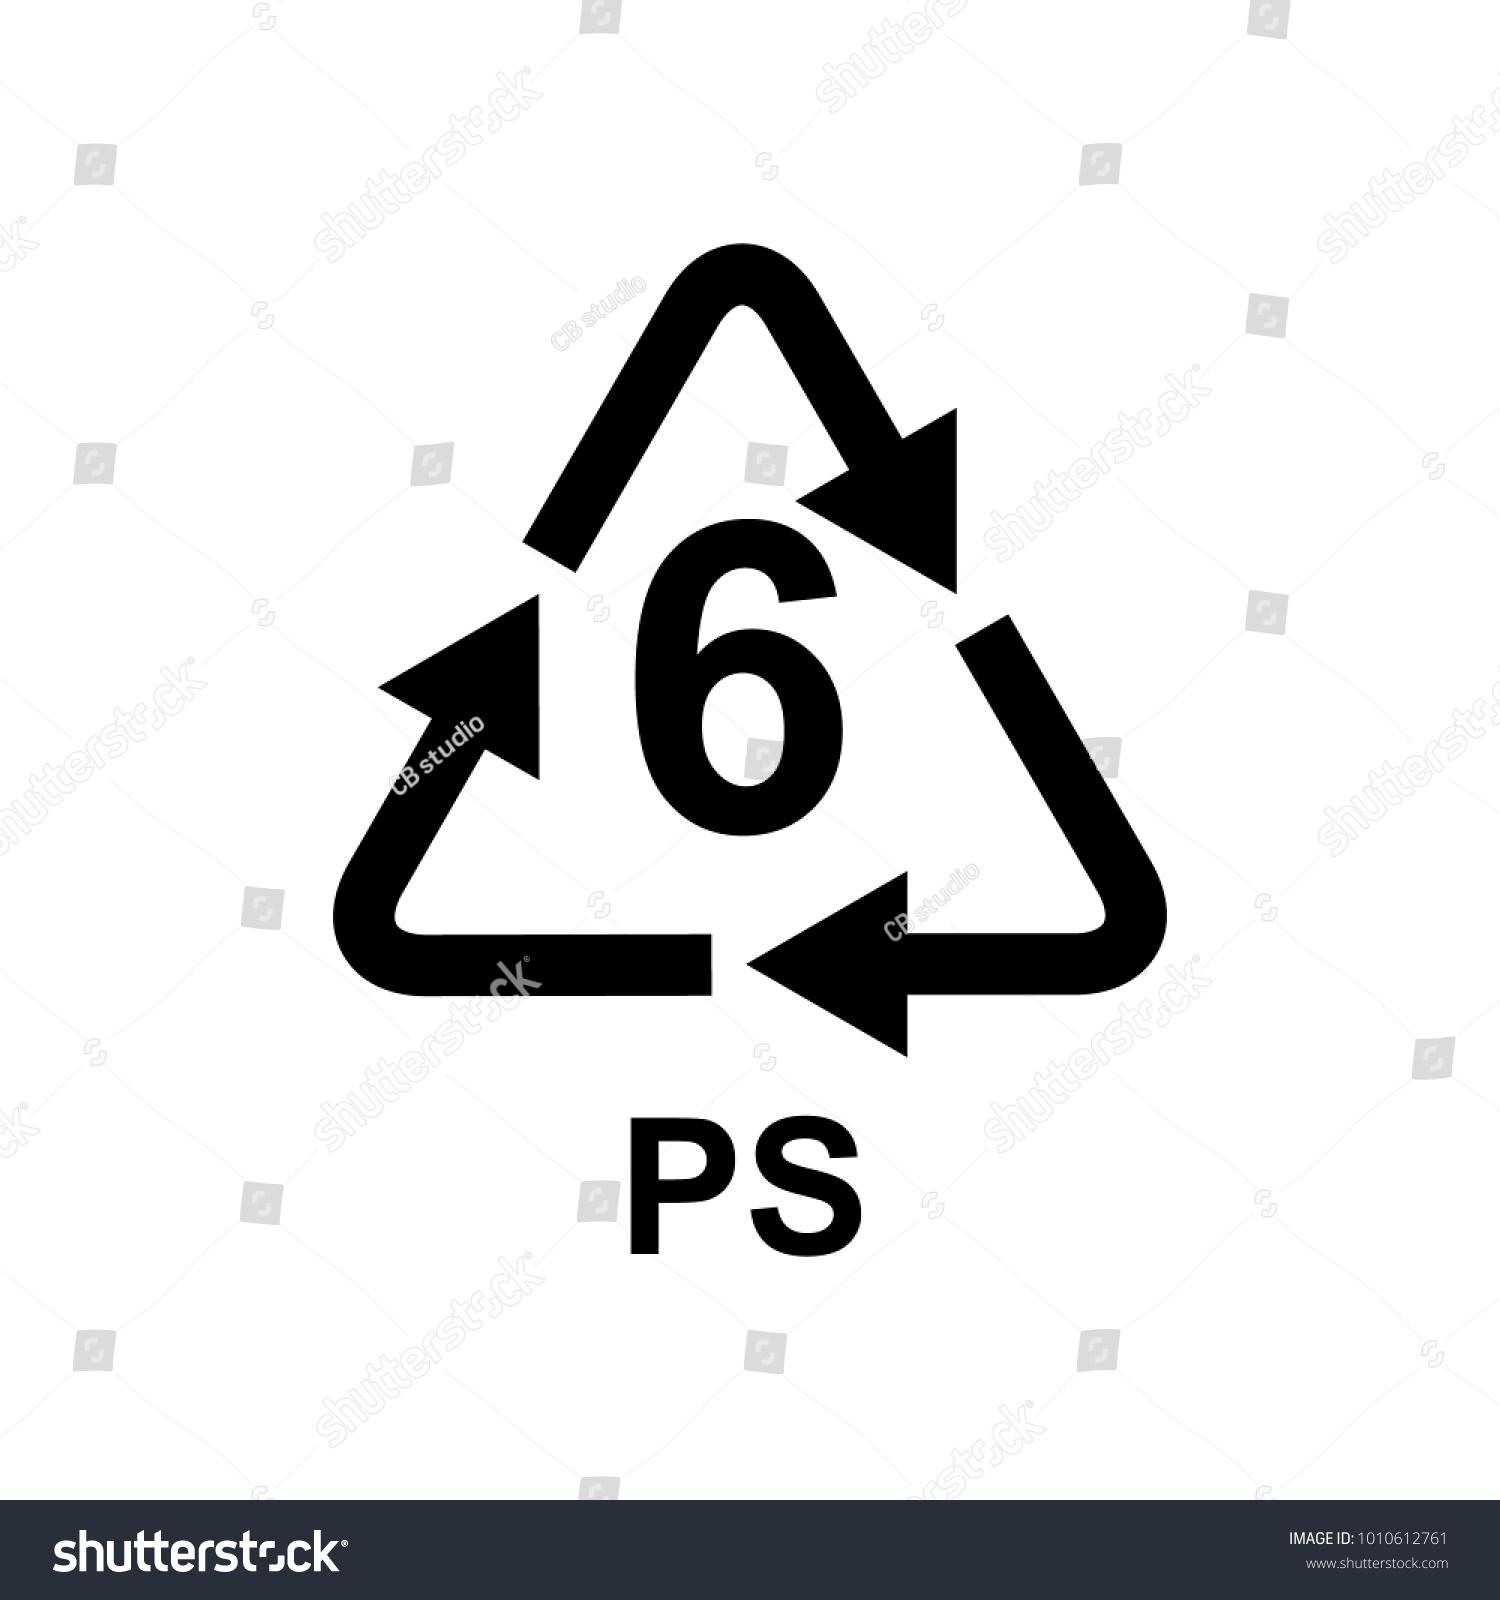 Plastic recycling symbol 6 ps stock vector 1010612761 shutterstock plastic recycling symbol 6 ps biocorpaavc